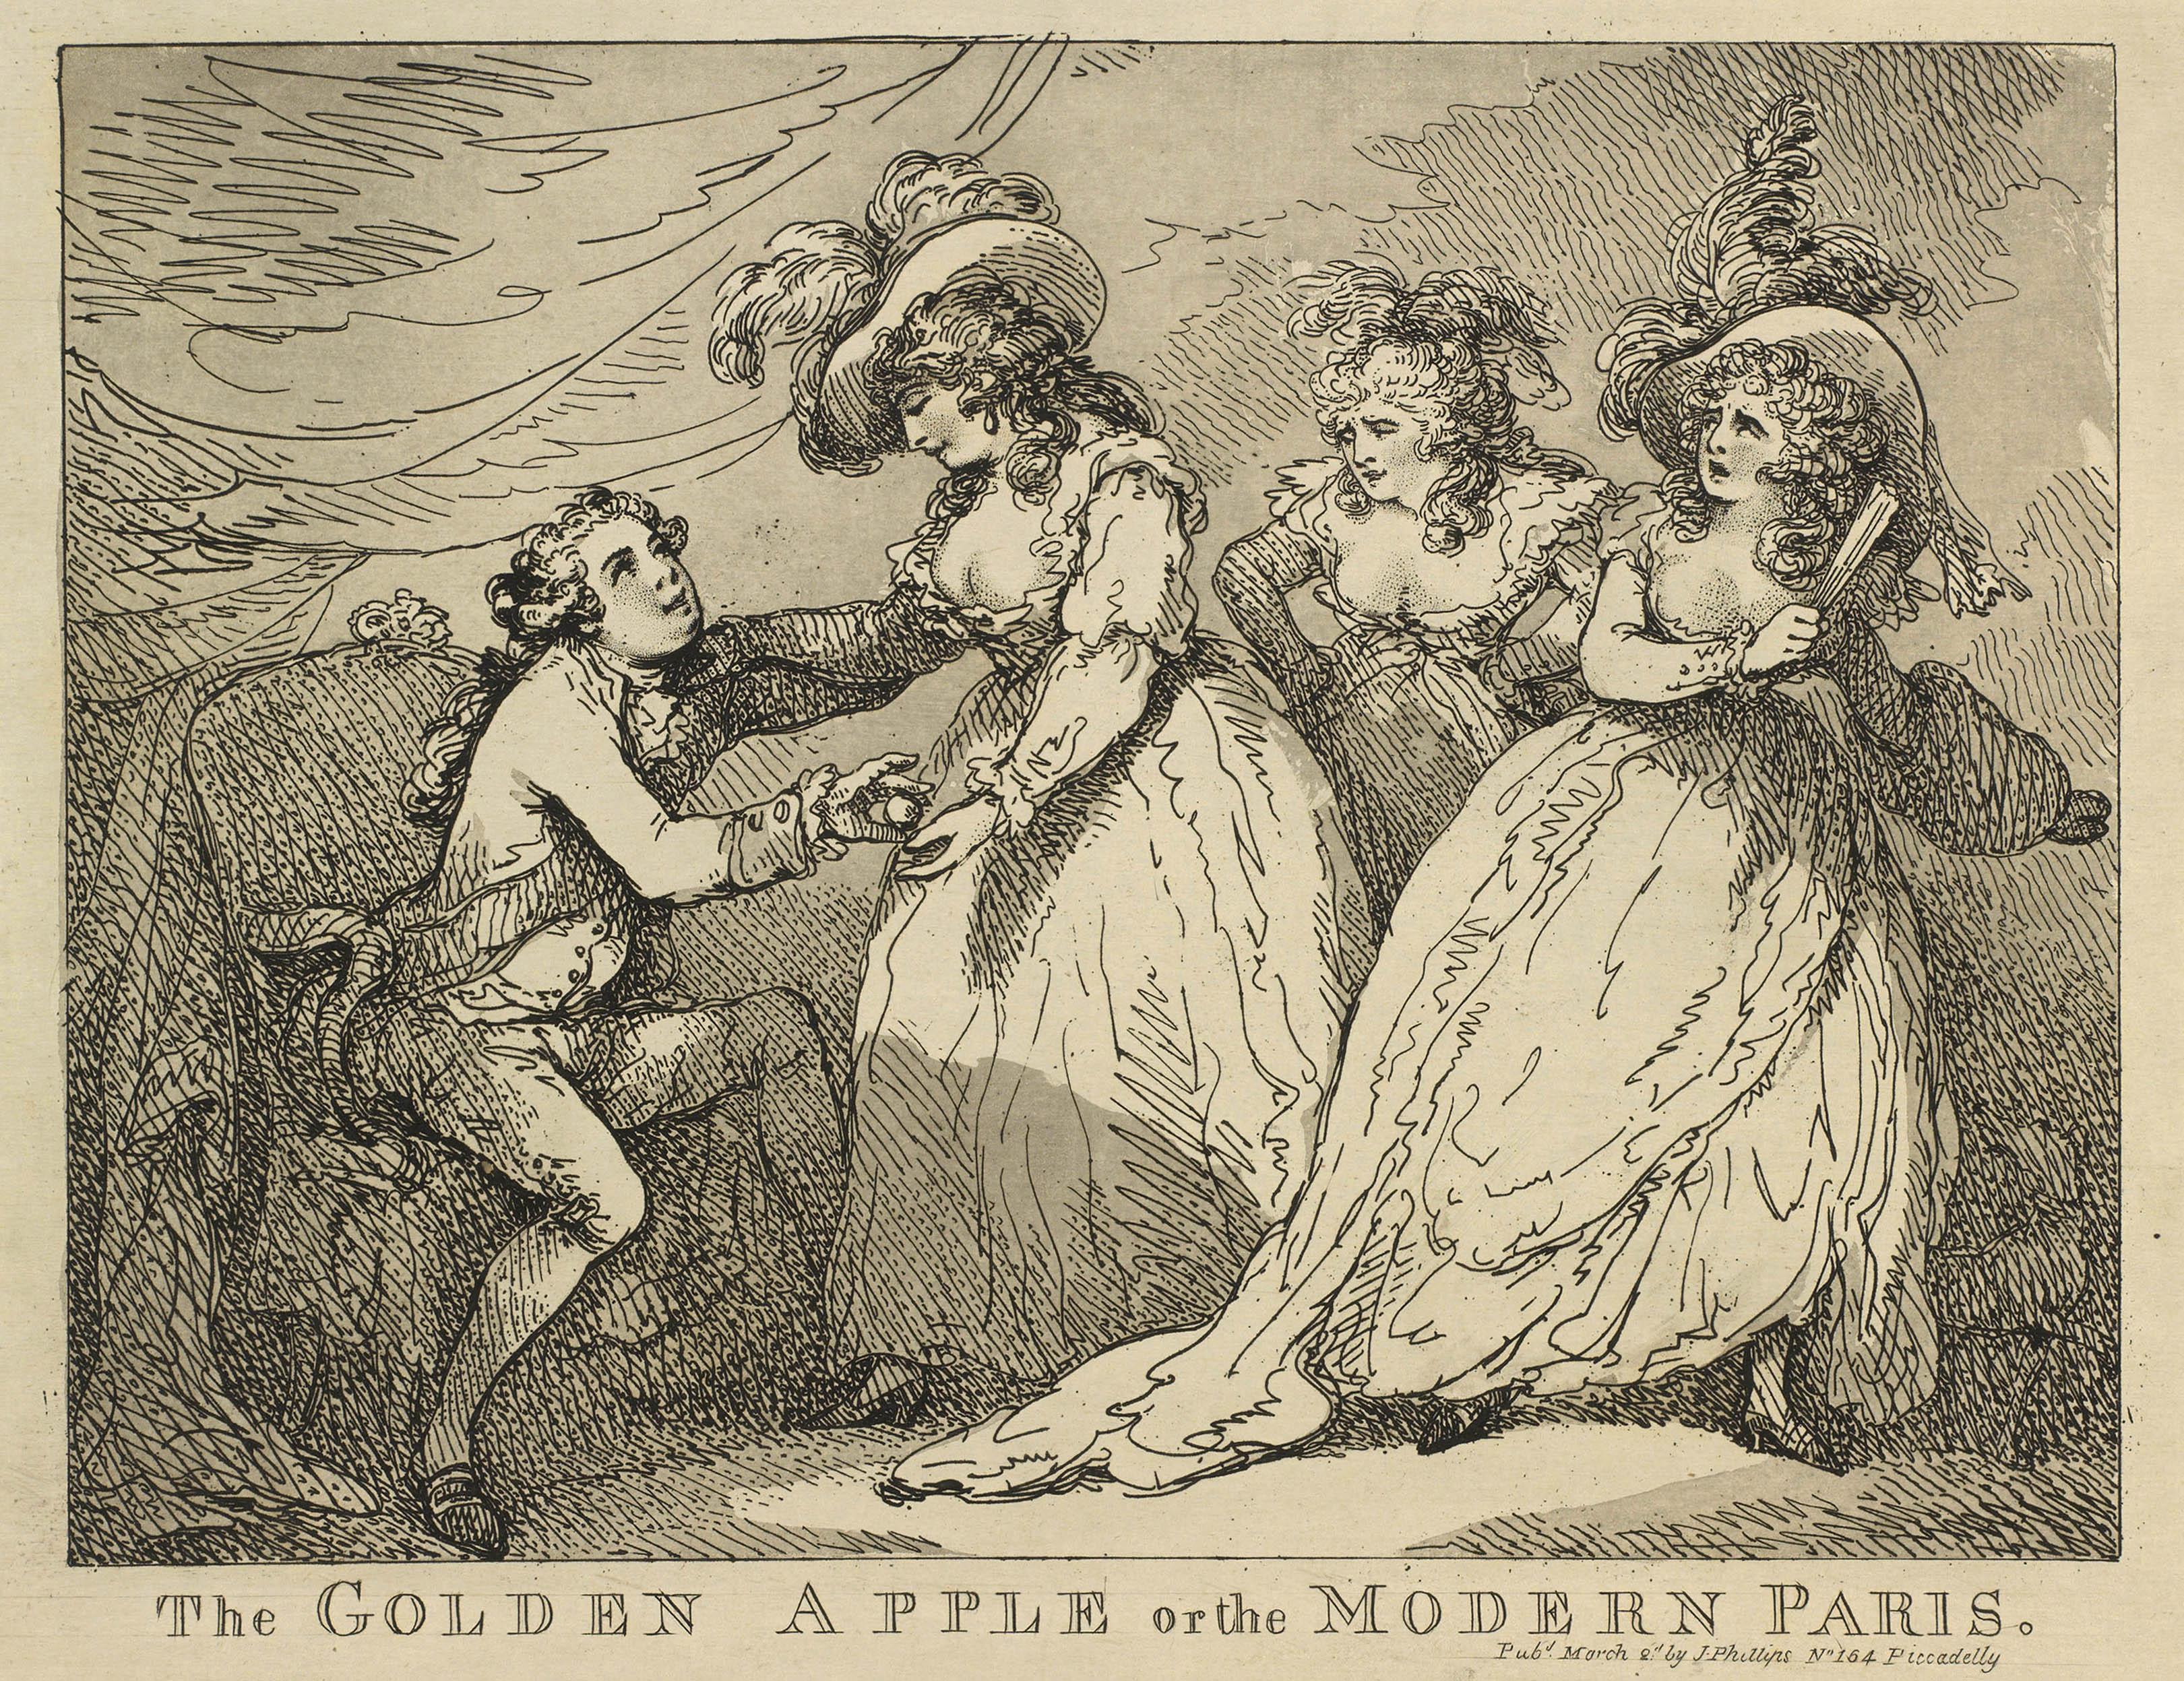 Thomas Rowlandson, The Golden Apple, or the Modern Paris, 1785